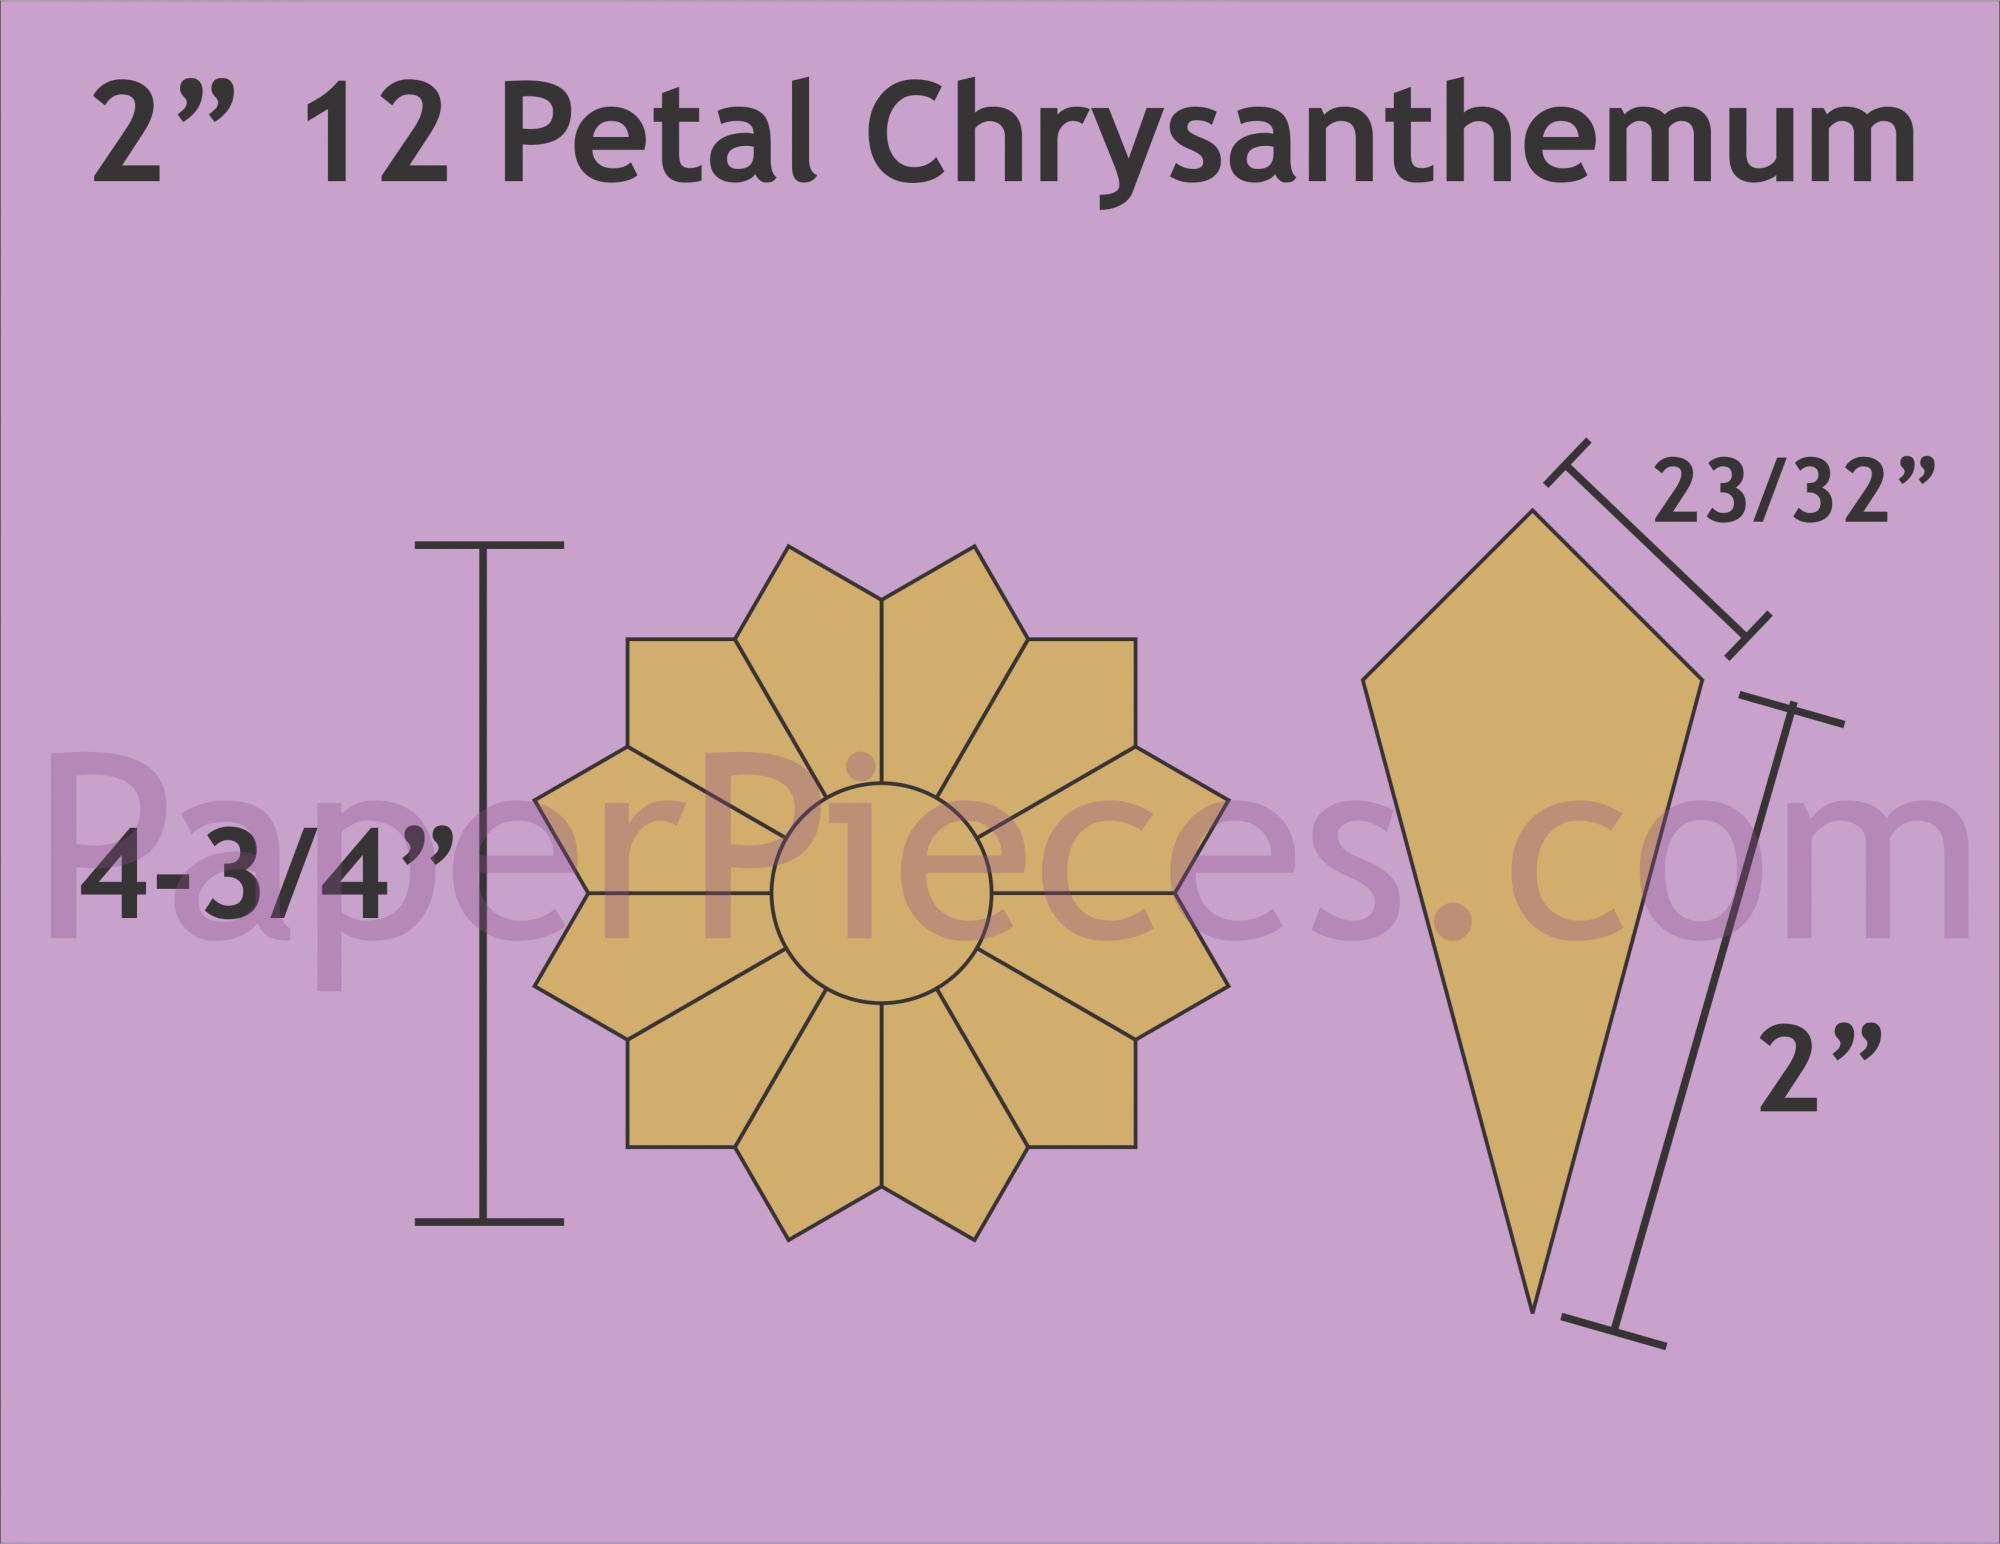 2 12 Petal Chrysanthemum (makes 42 plates)